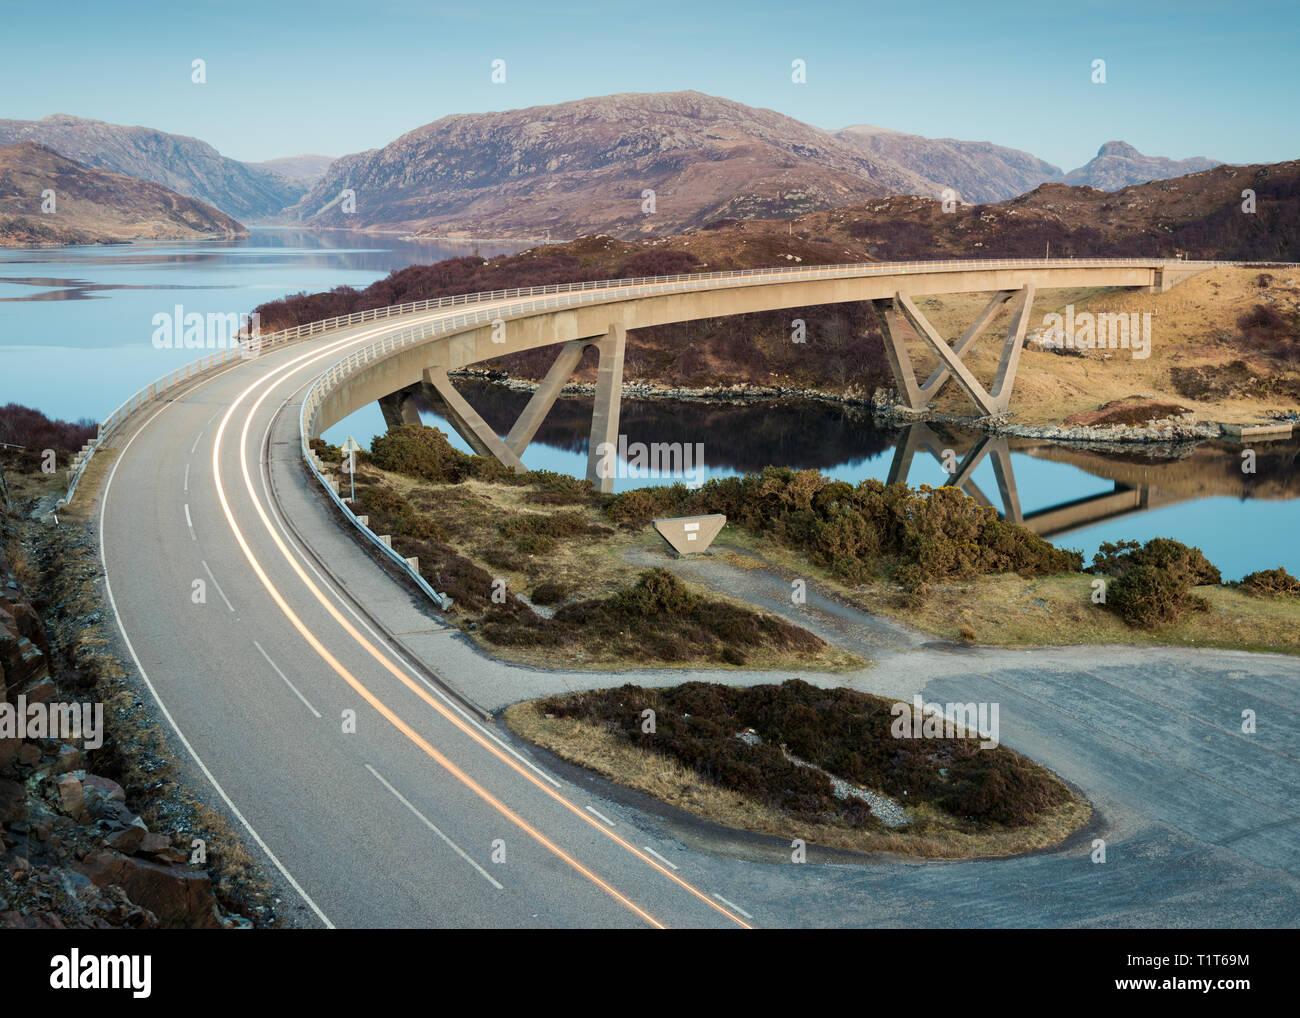 The Kylesku Bridge crossing at sunset with car tail light streaks along the road, Assynt, Scottish Highlands, UK - Stock Image